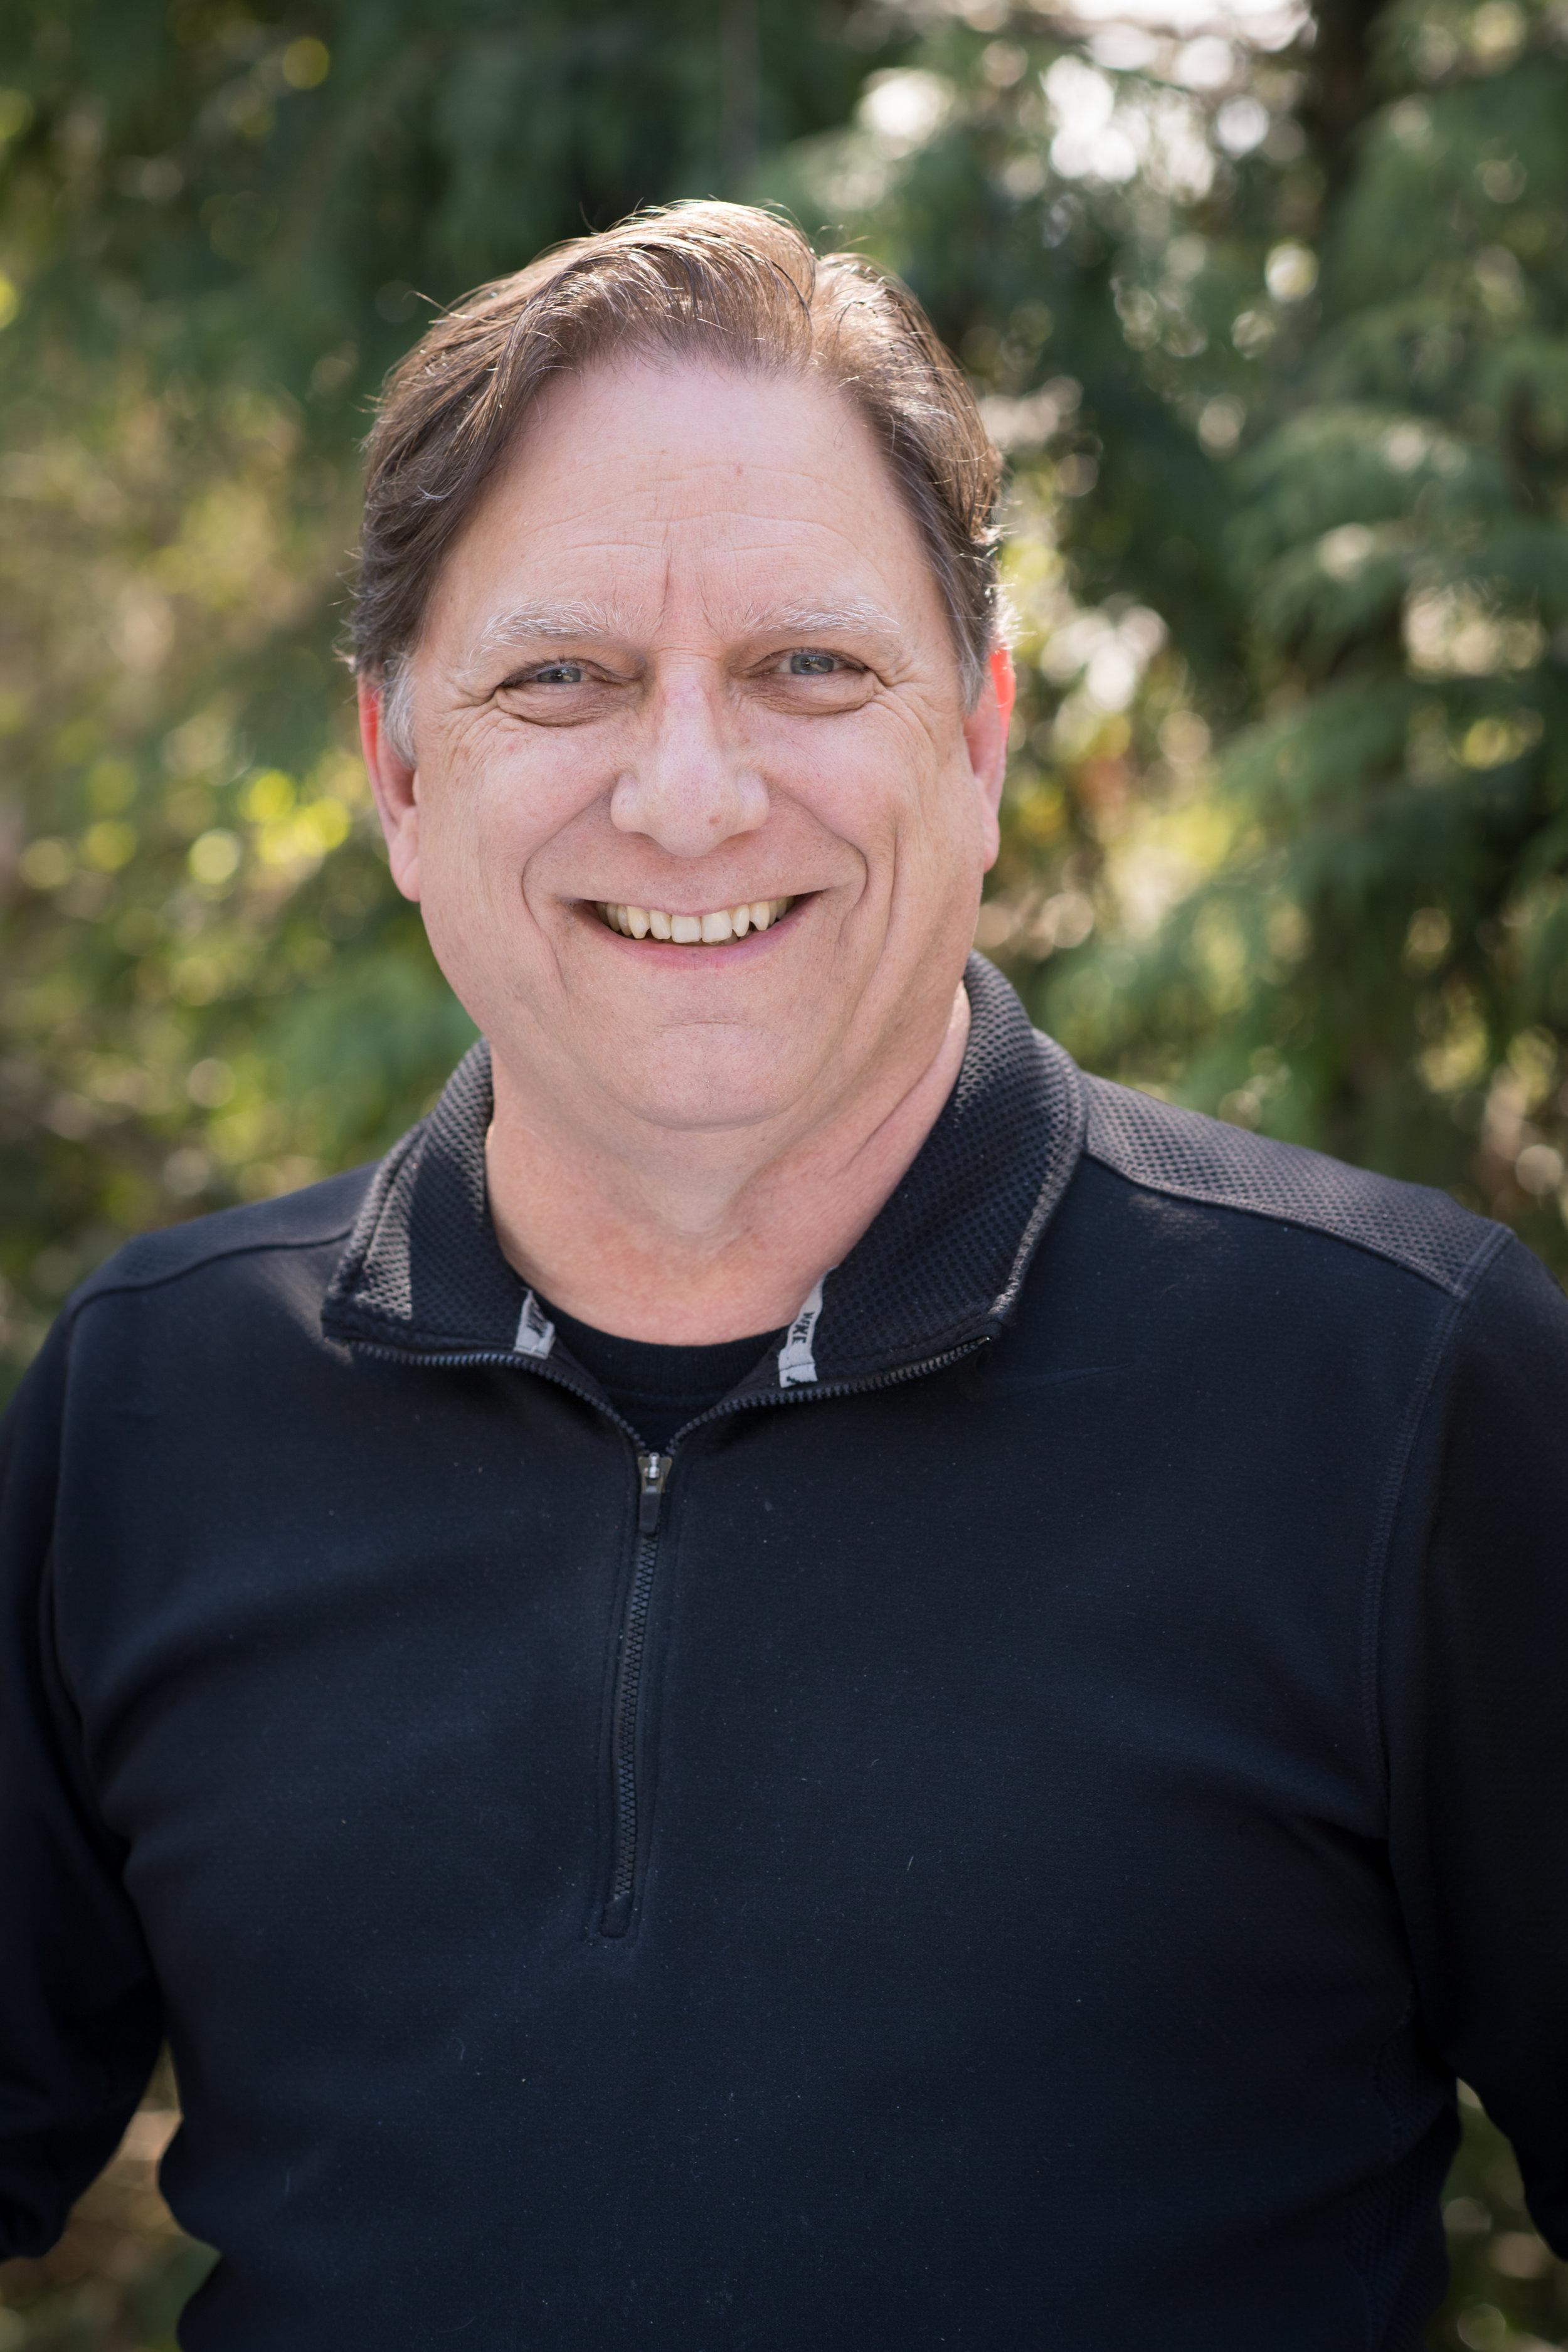 Paul Konrady, Sewer District Administer